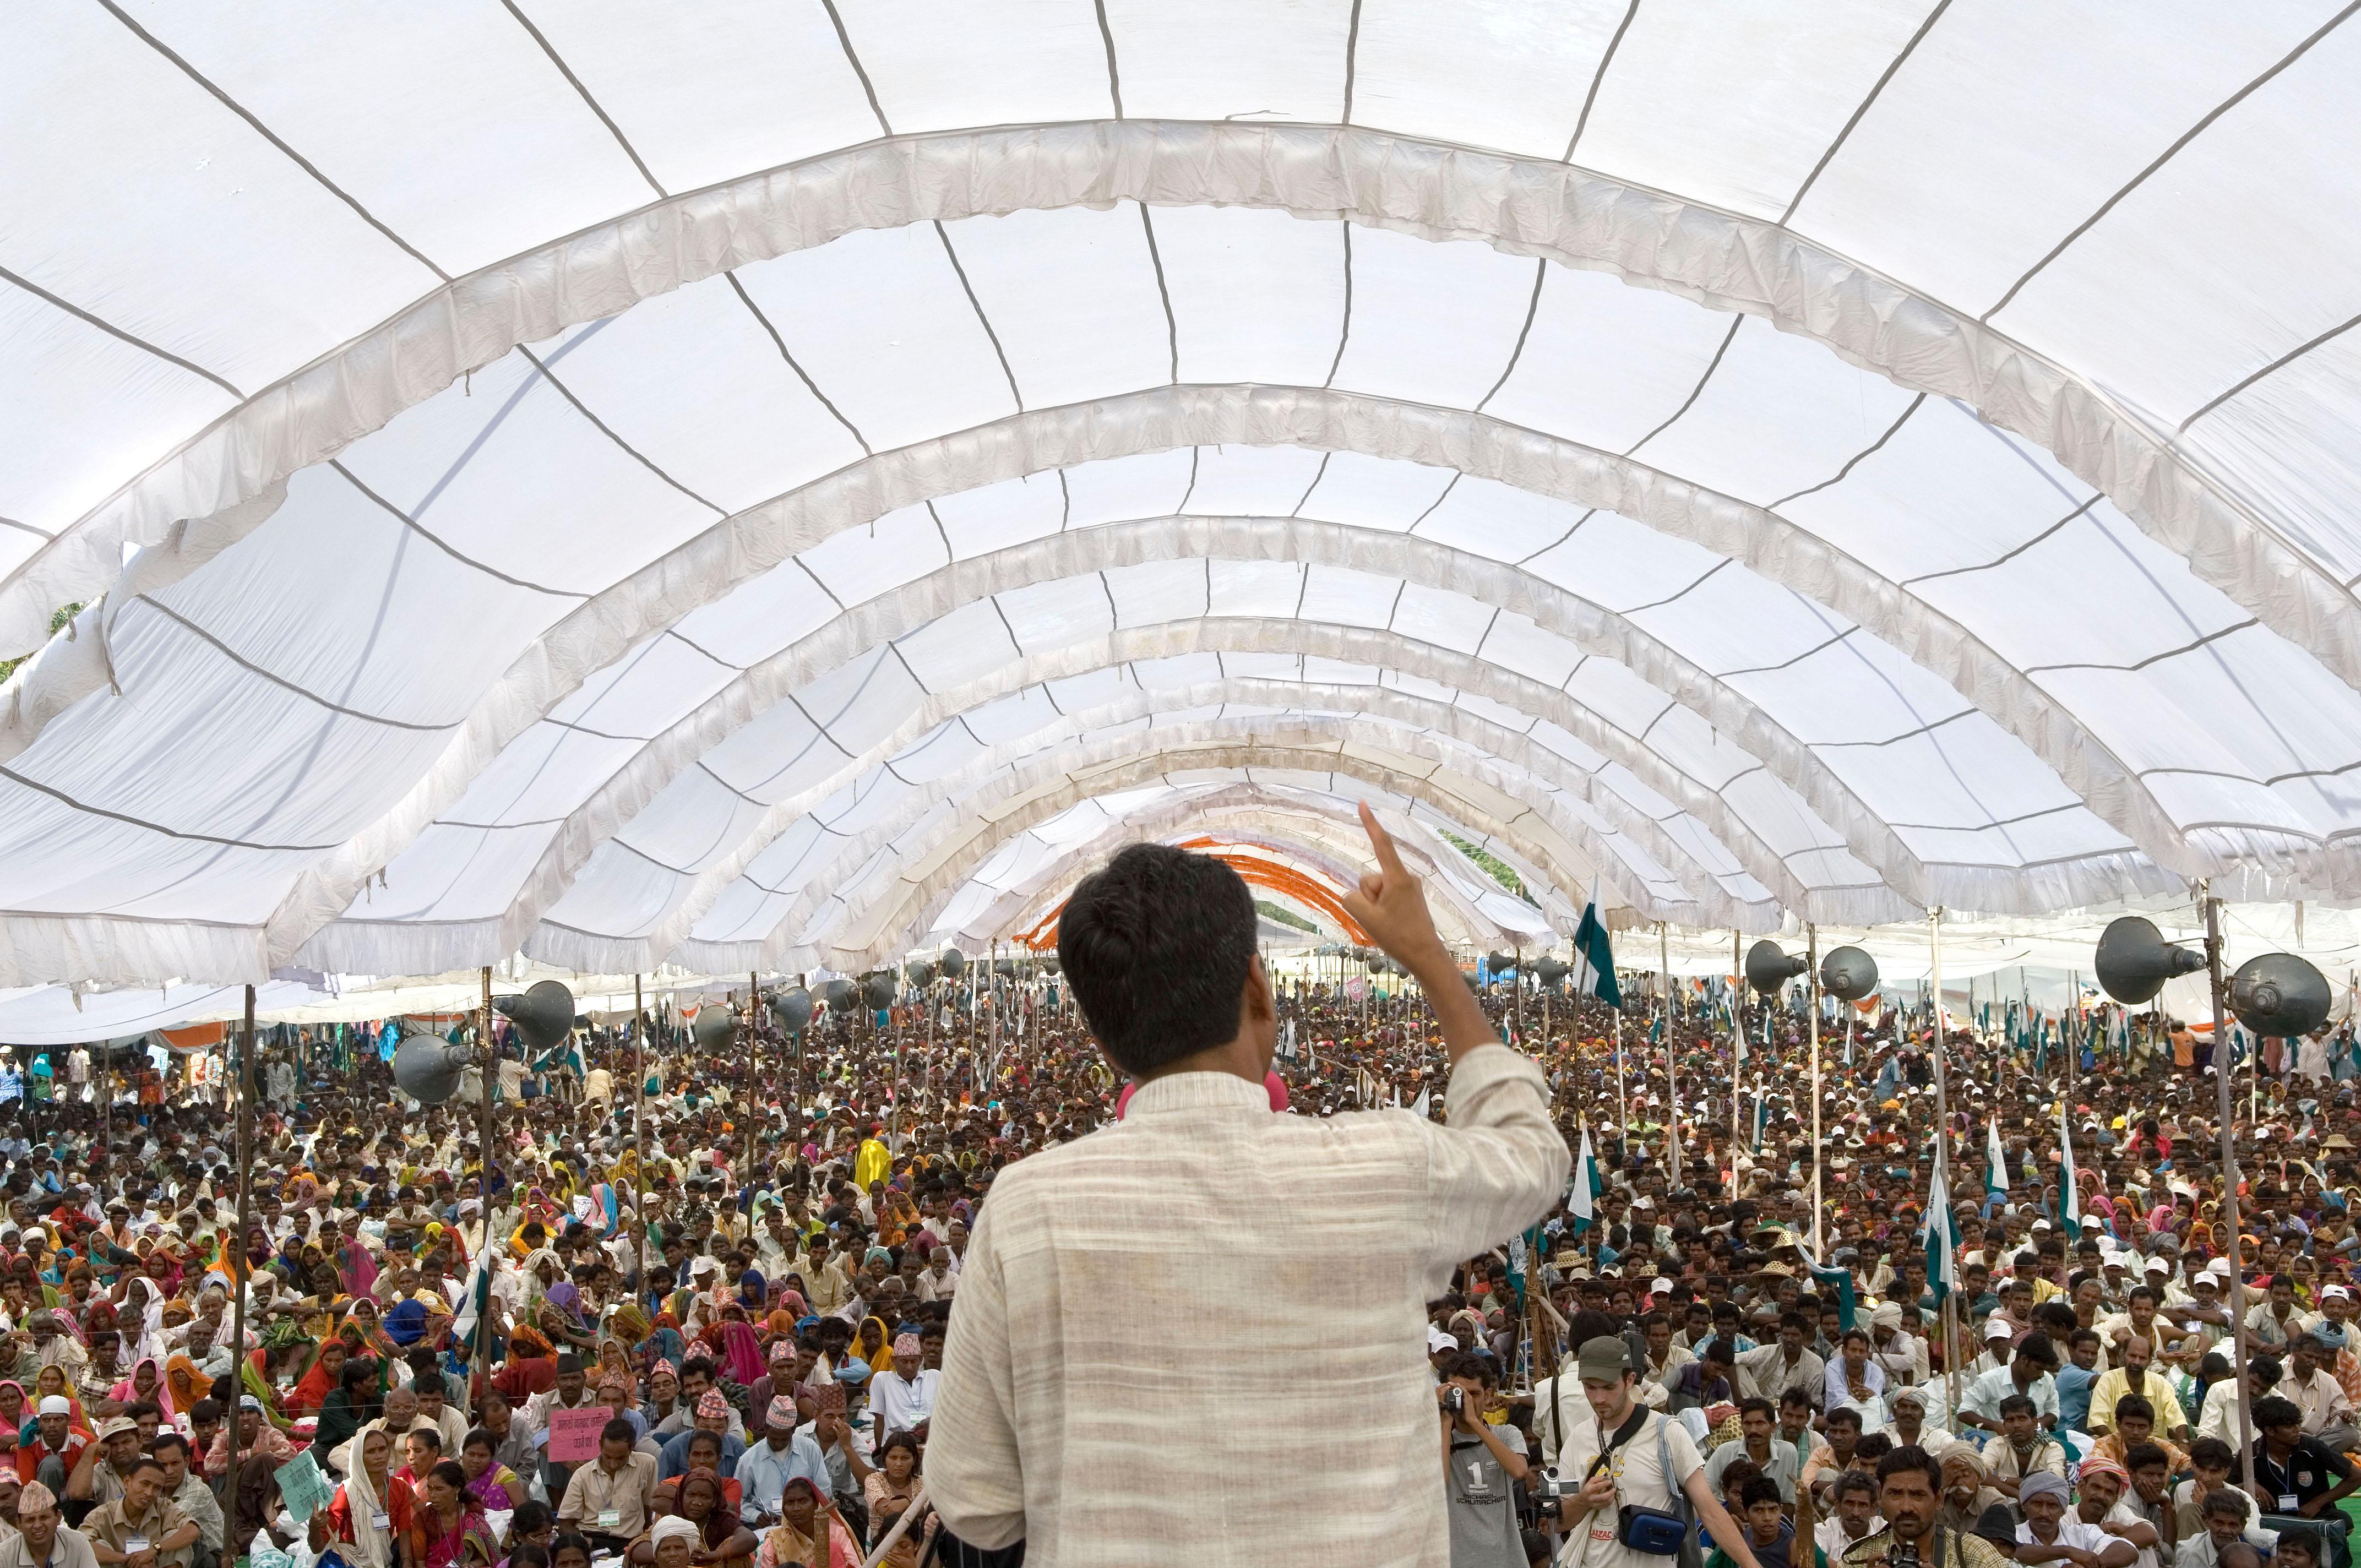 quco-14 large crowd.jpg